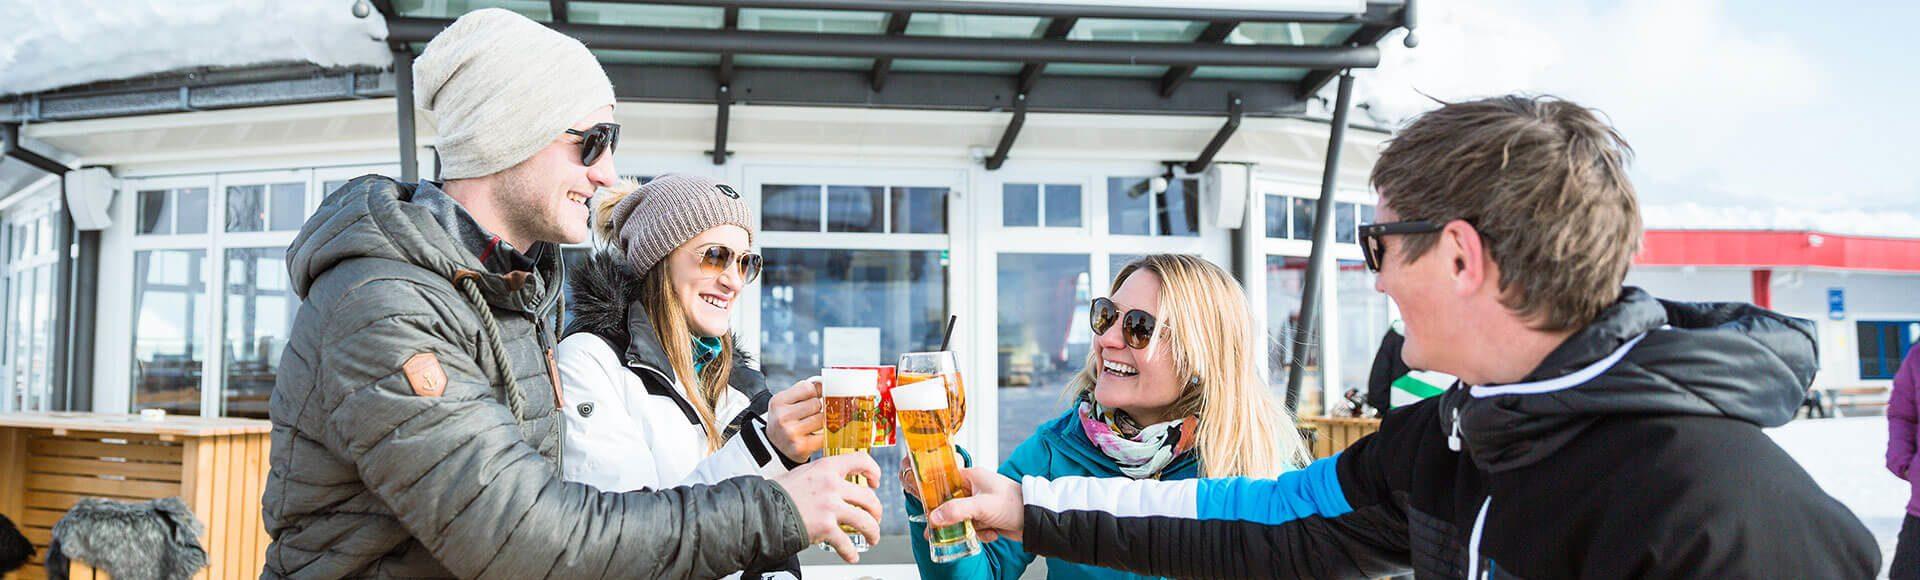 Huetten Apres Ski Tourismusverband Radstadt Markus Rohrbacher 1